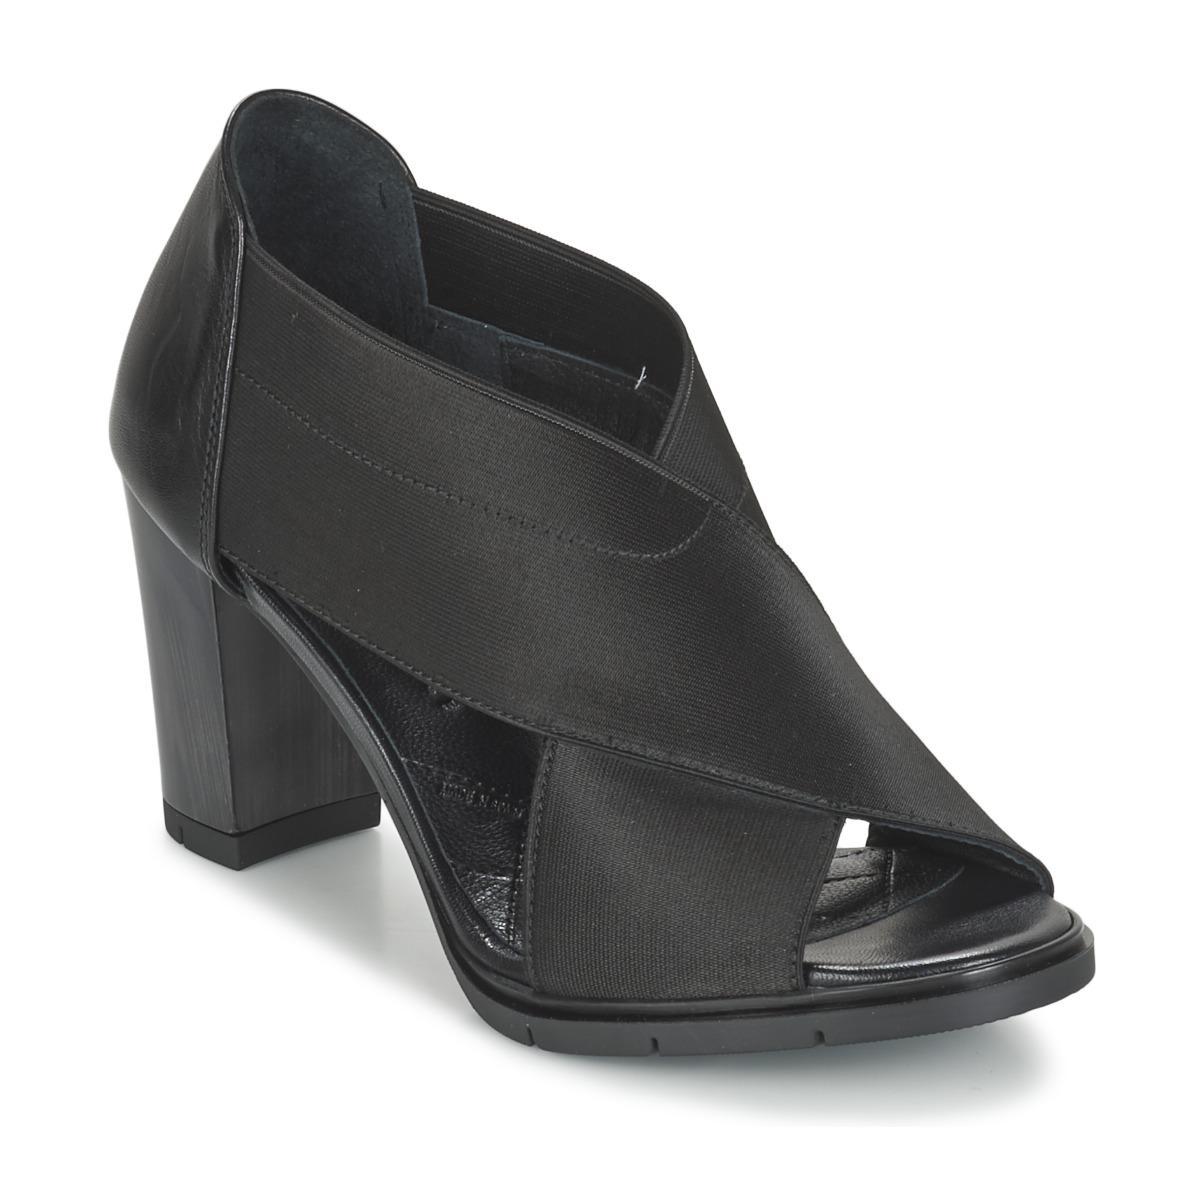 d61d9d464299aa Hispanitas Darete Women s Sandals In Black in Black - Lyst